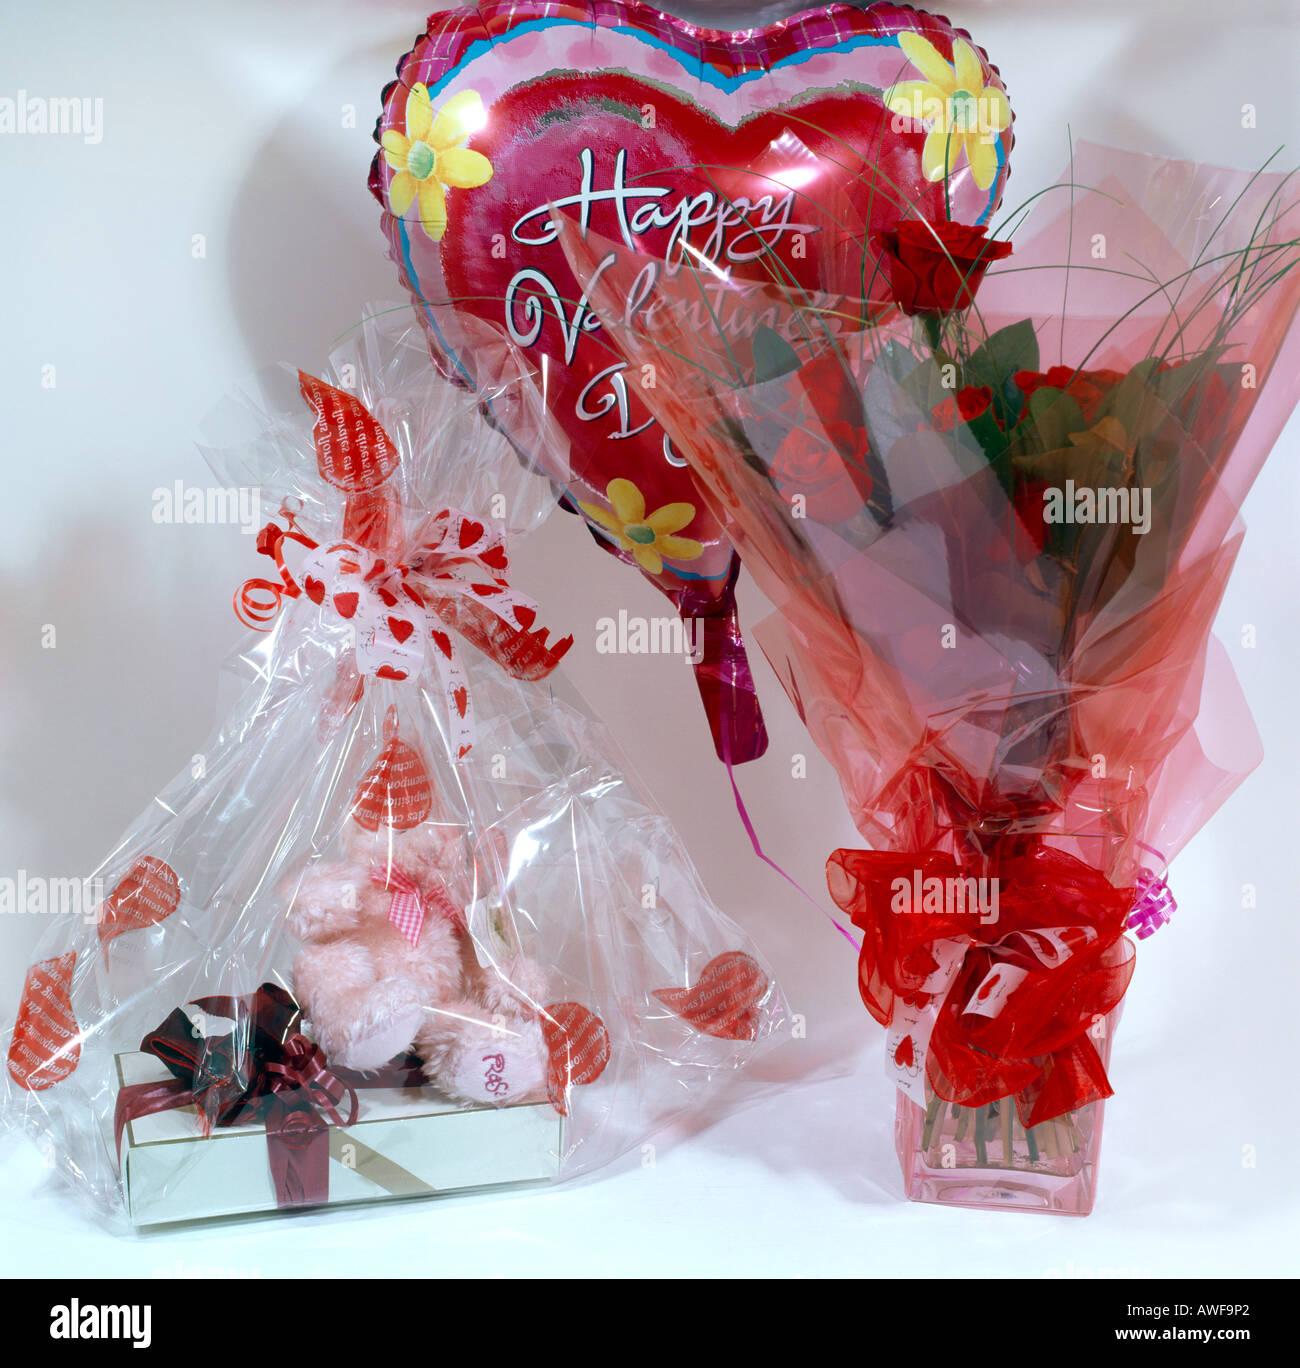 Happy Valentines Day Balloon Roses Teddy Bear U0026 Chocolates